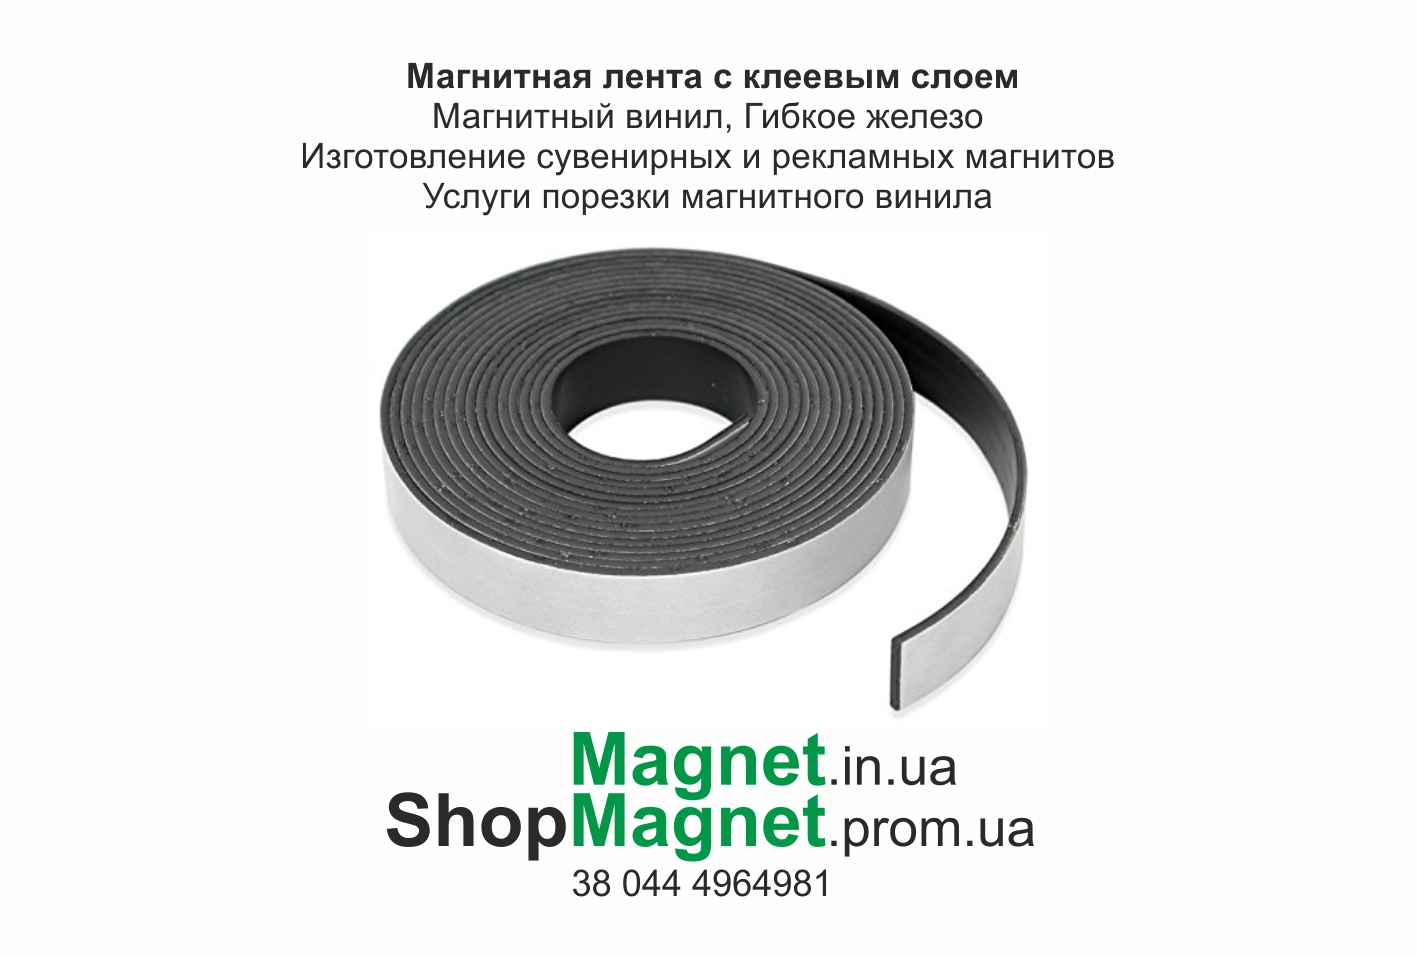 Гибкая магнитная лента, Гнучка магнітна стрічка